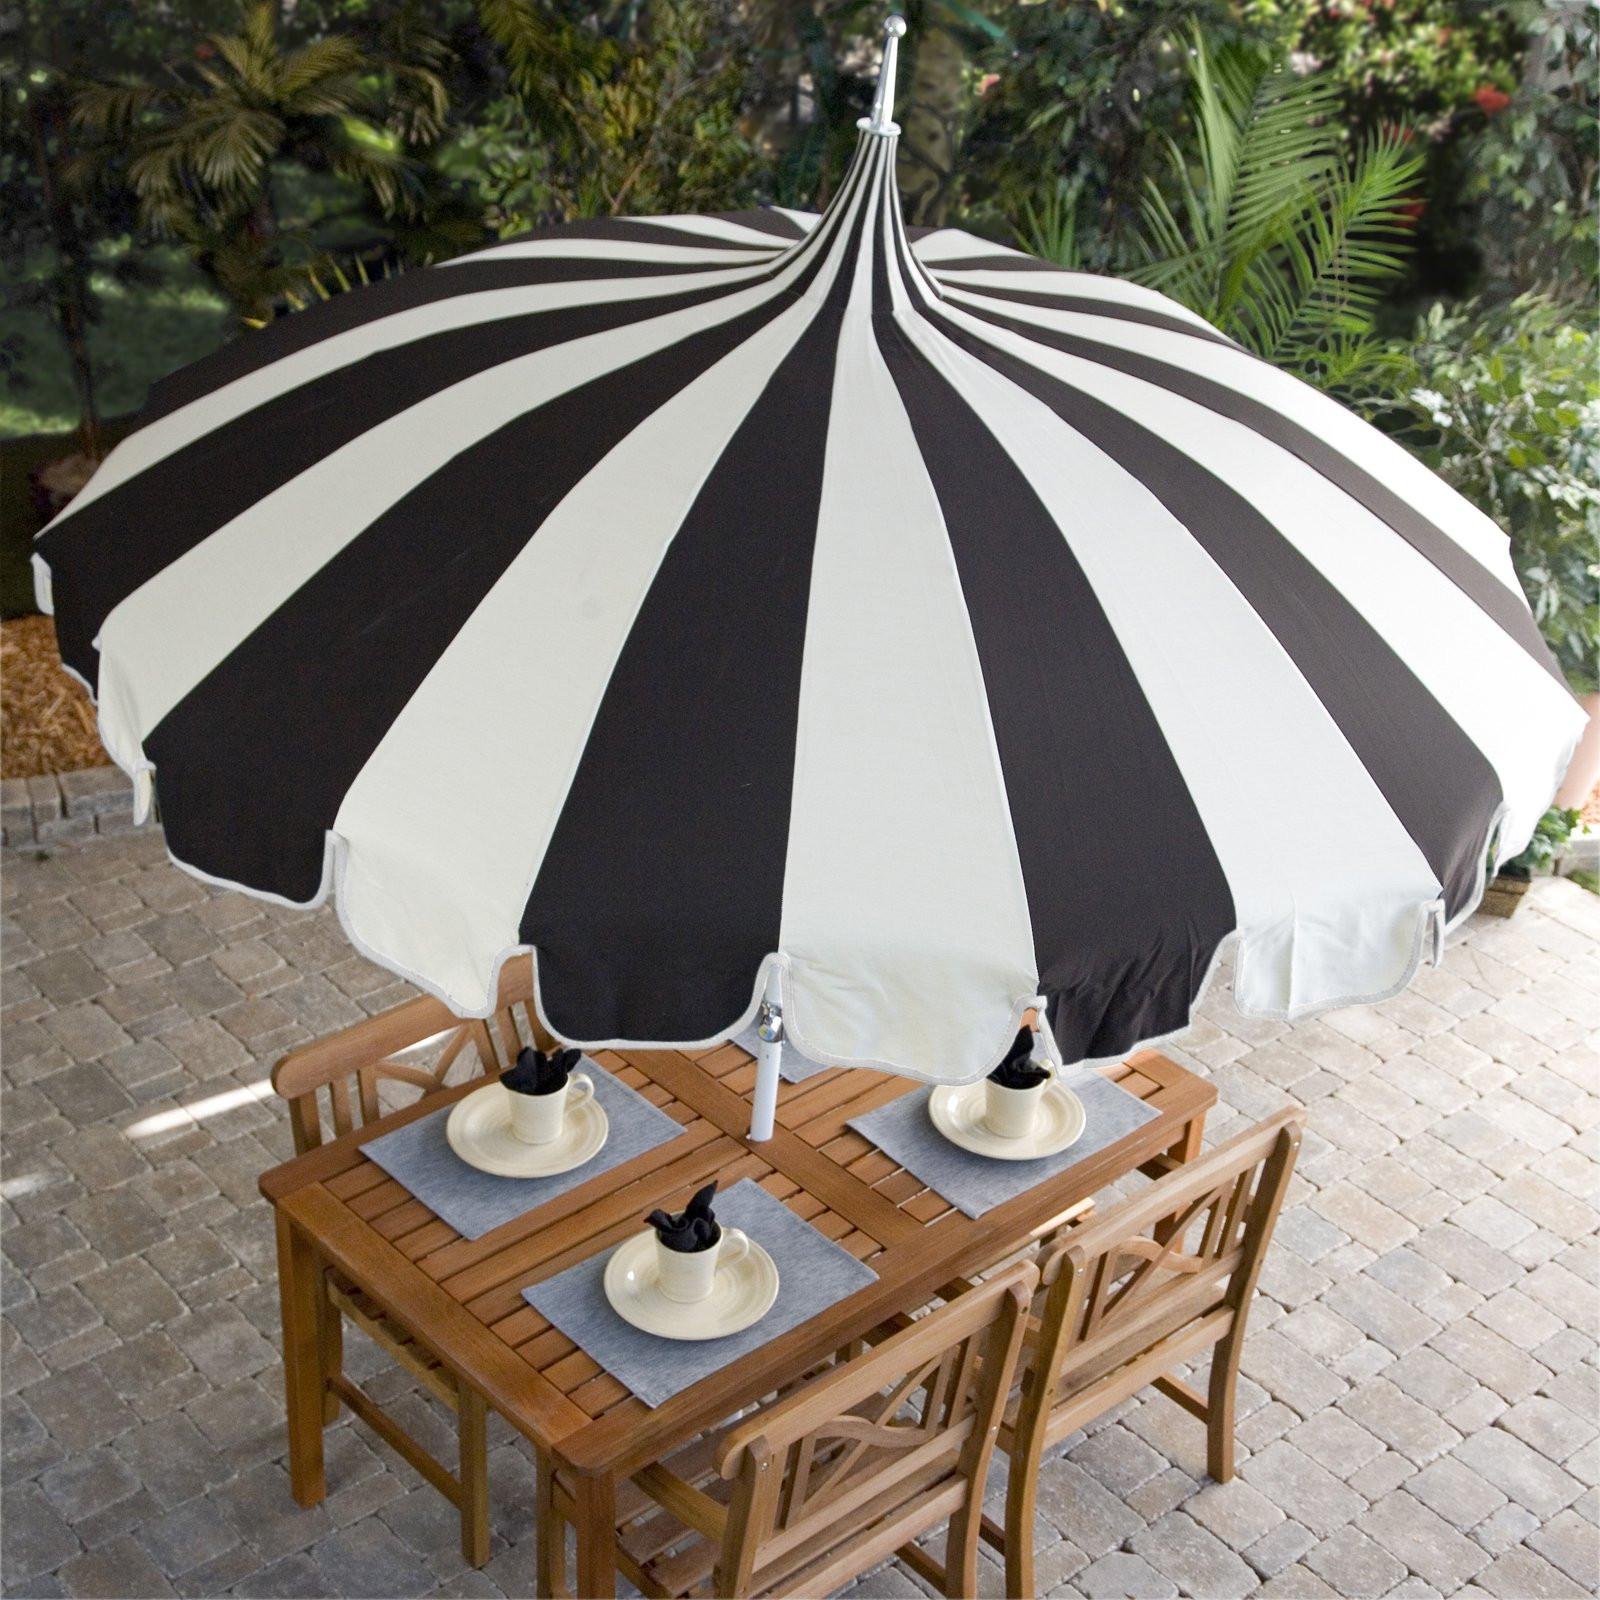 Delicieux 5 Foot Patio Umbrella World Market Patio Designs For Proportions 1600 X 1600